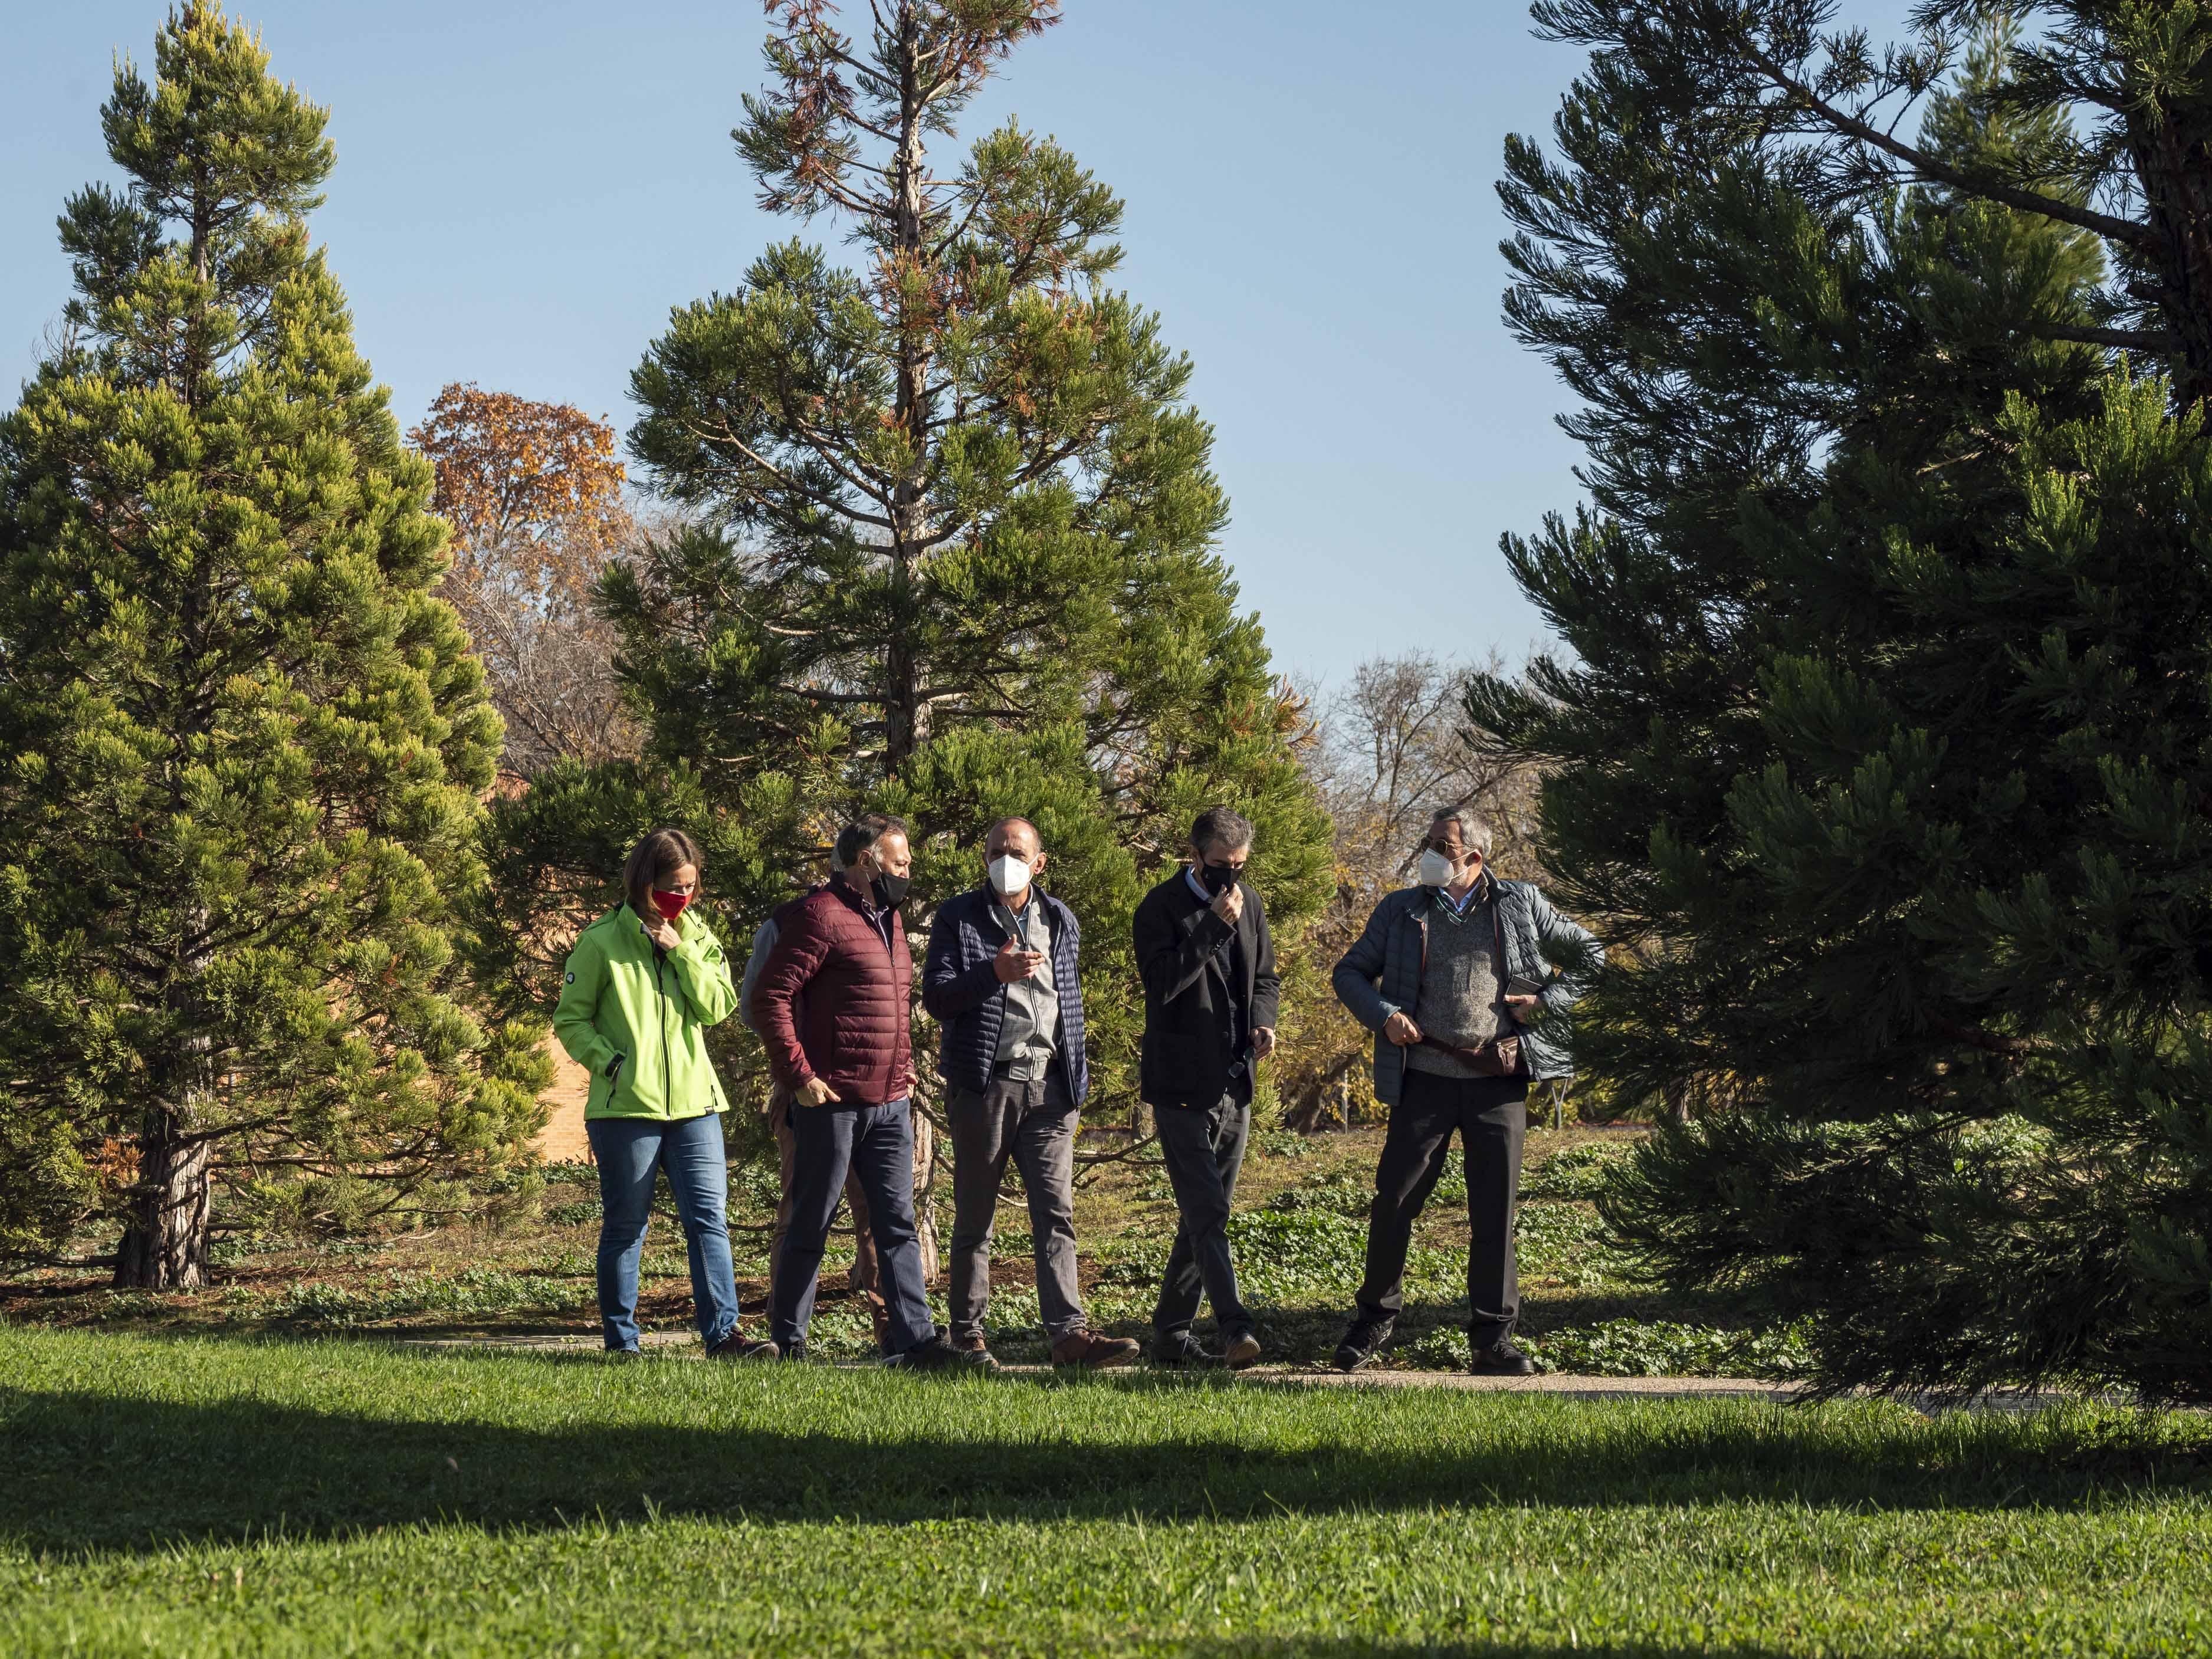 Paeria i Universitat animen la ciutadania a visitar l'Arborètum